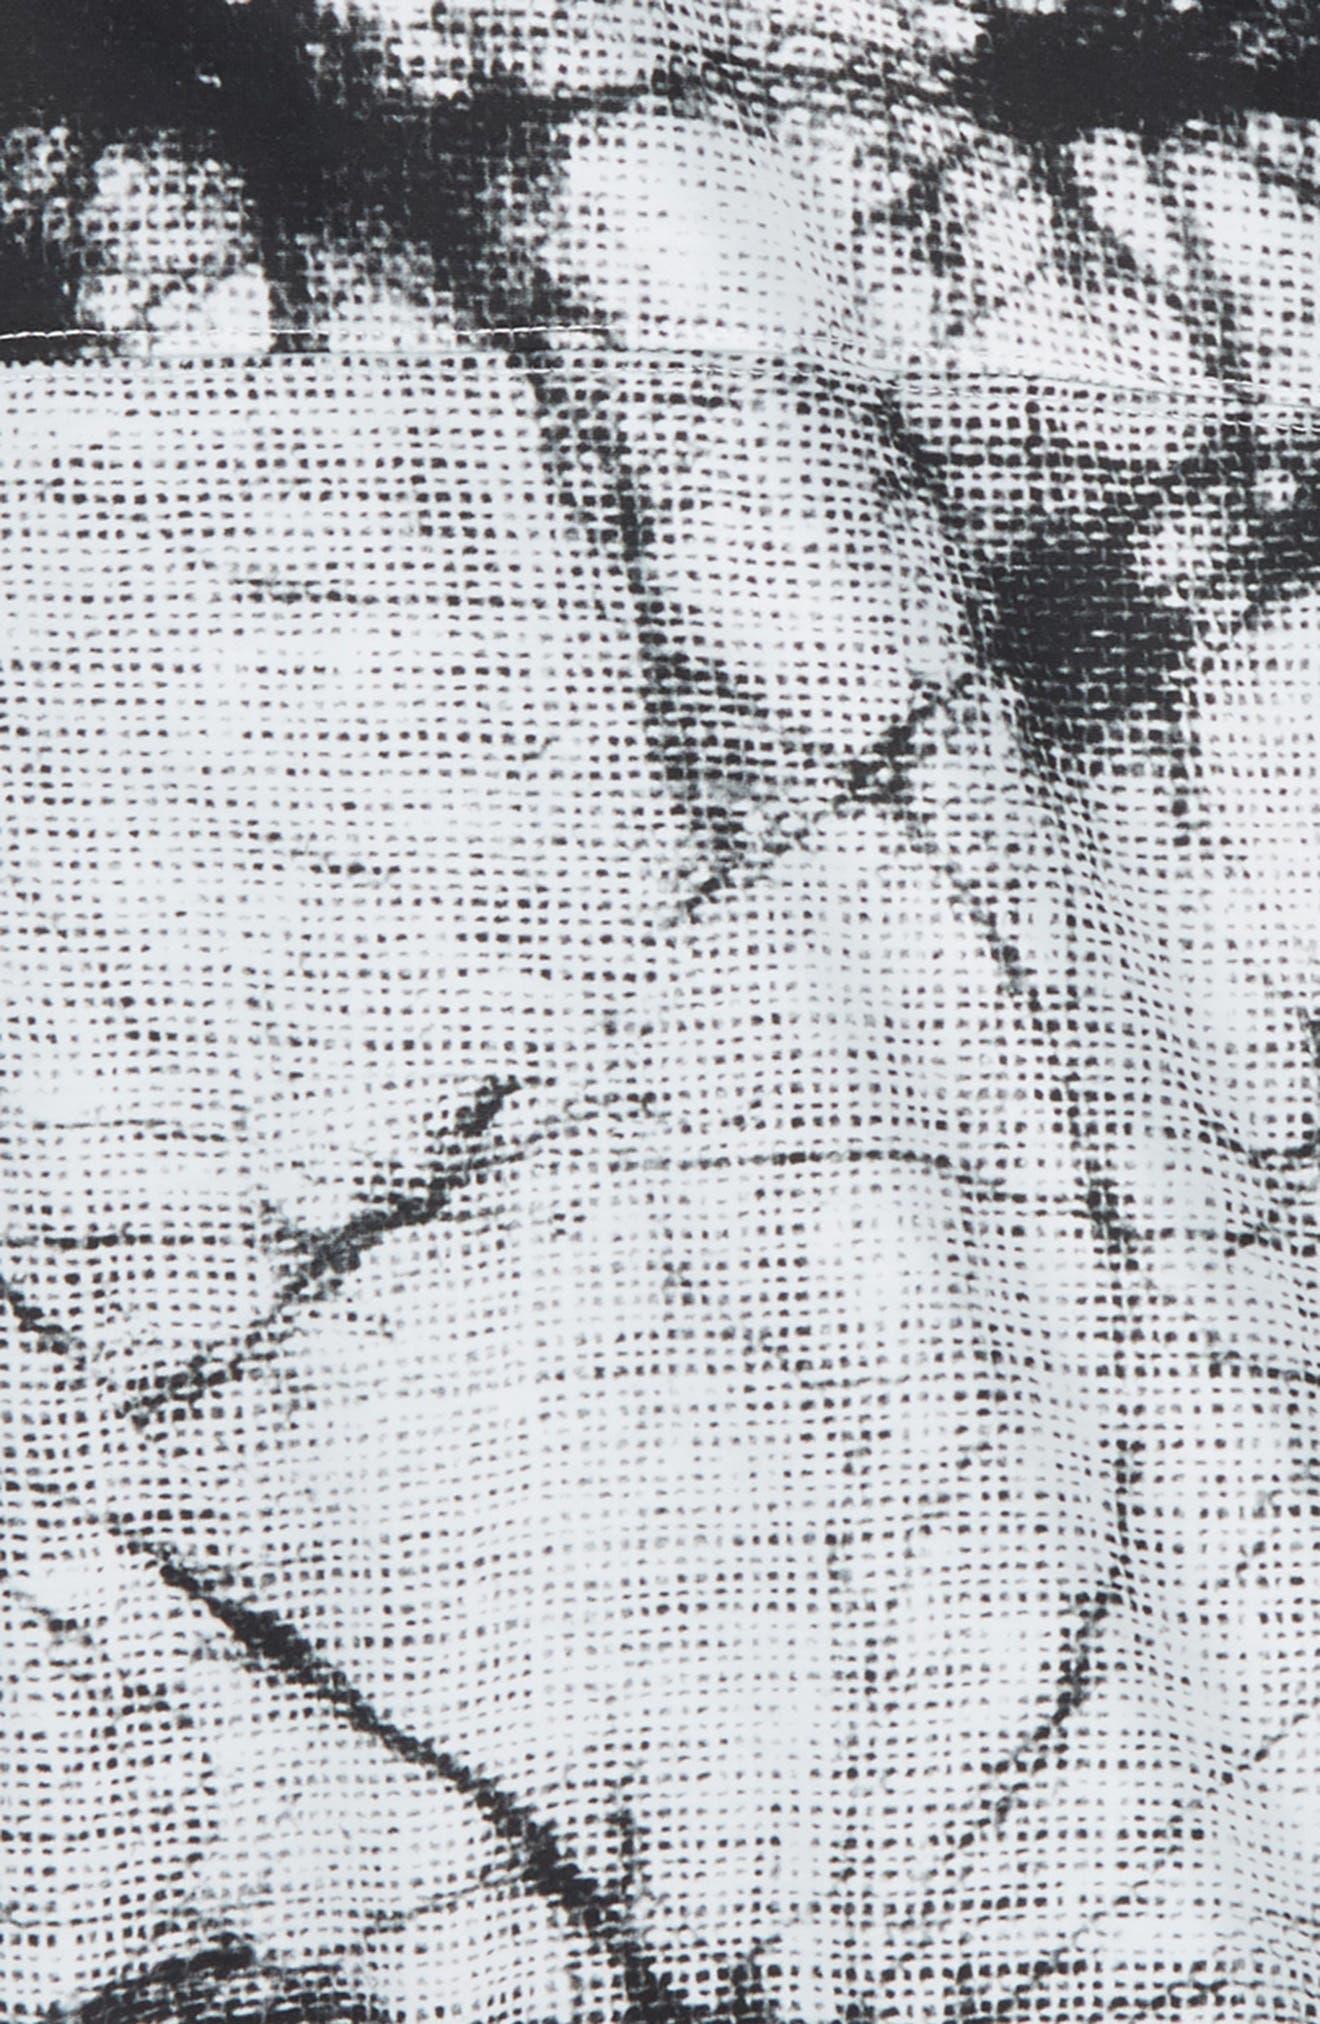 Prismo Organic Cotton T-Shirt,                             Alternate thumbnail 2, color,                             Aop White